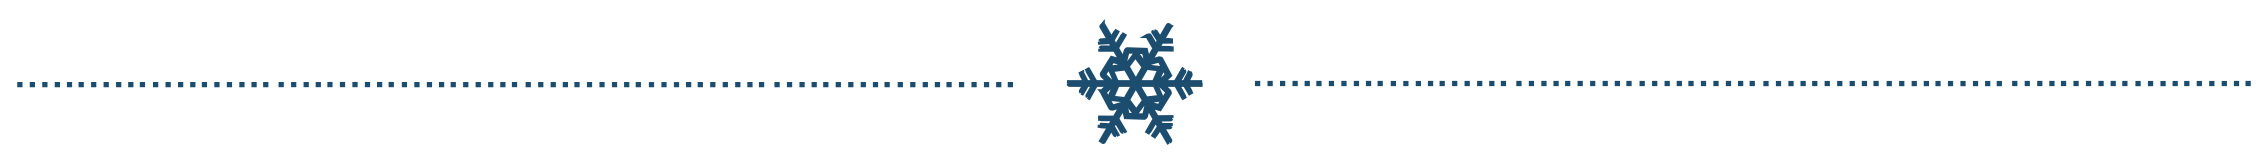 snow_ancora